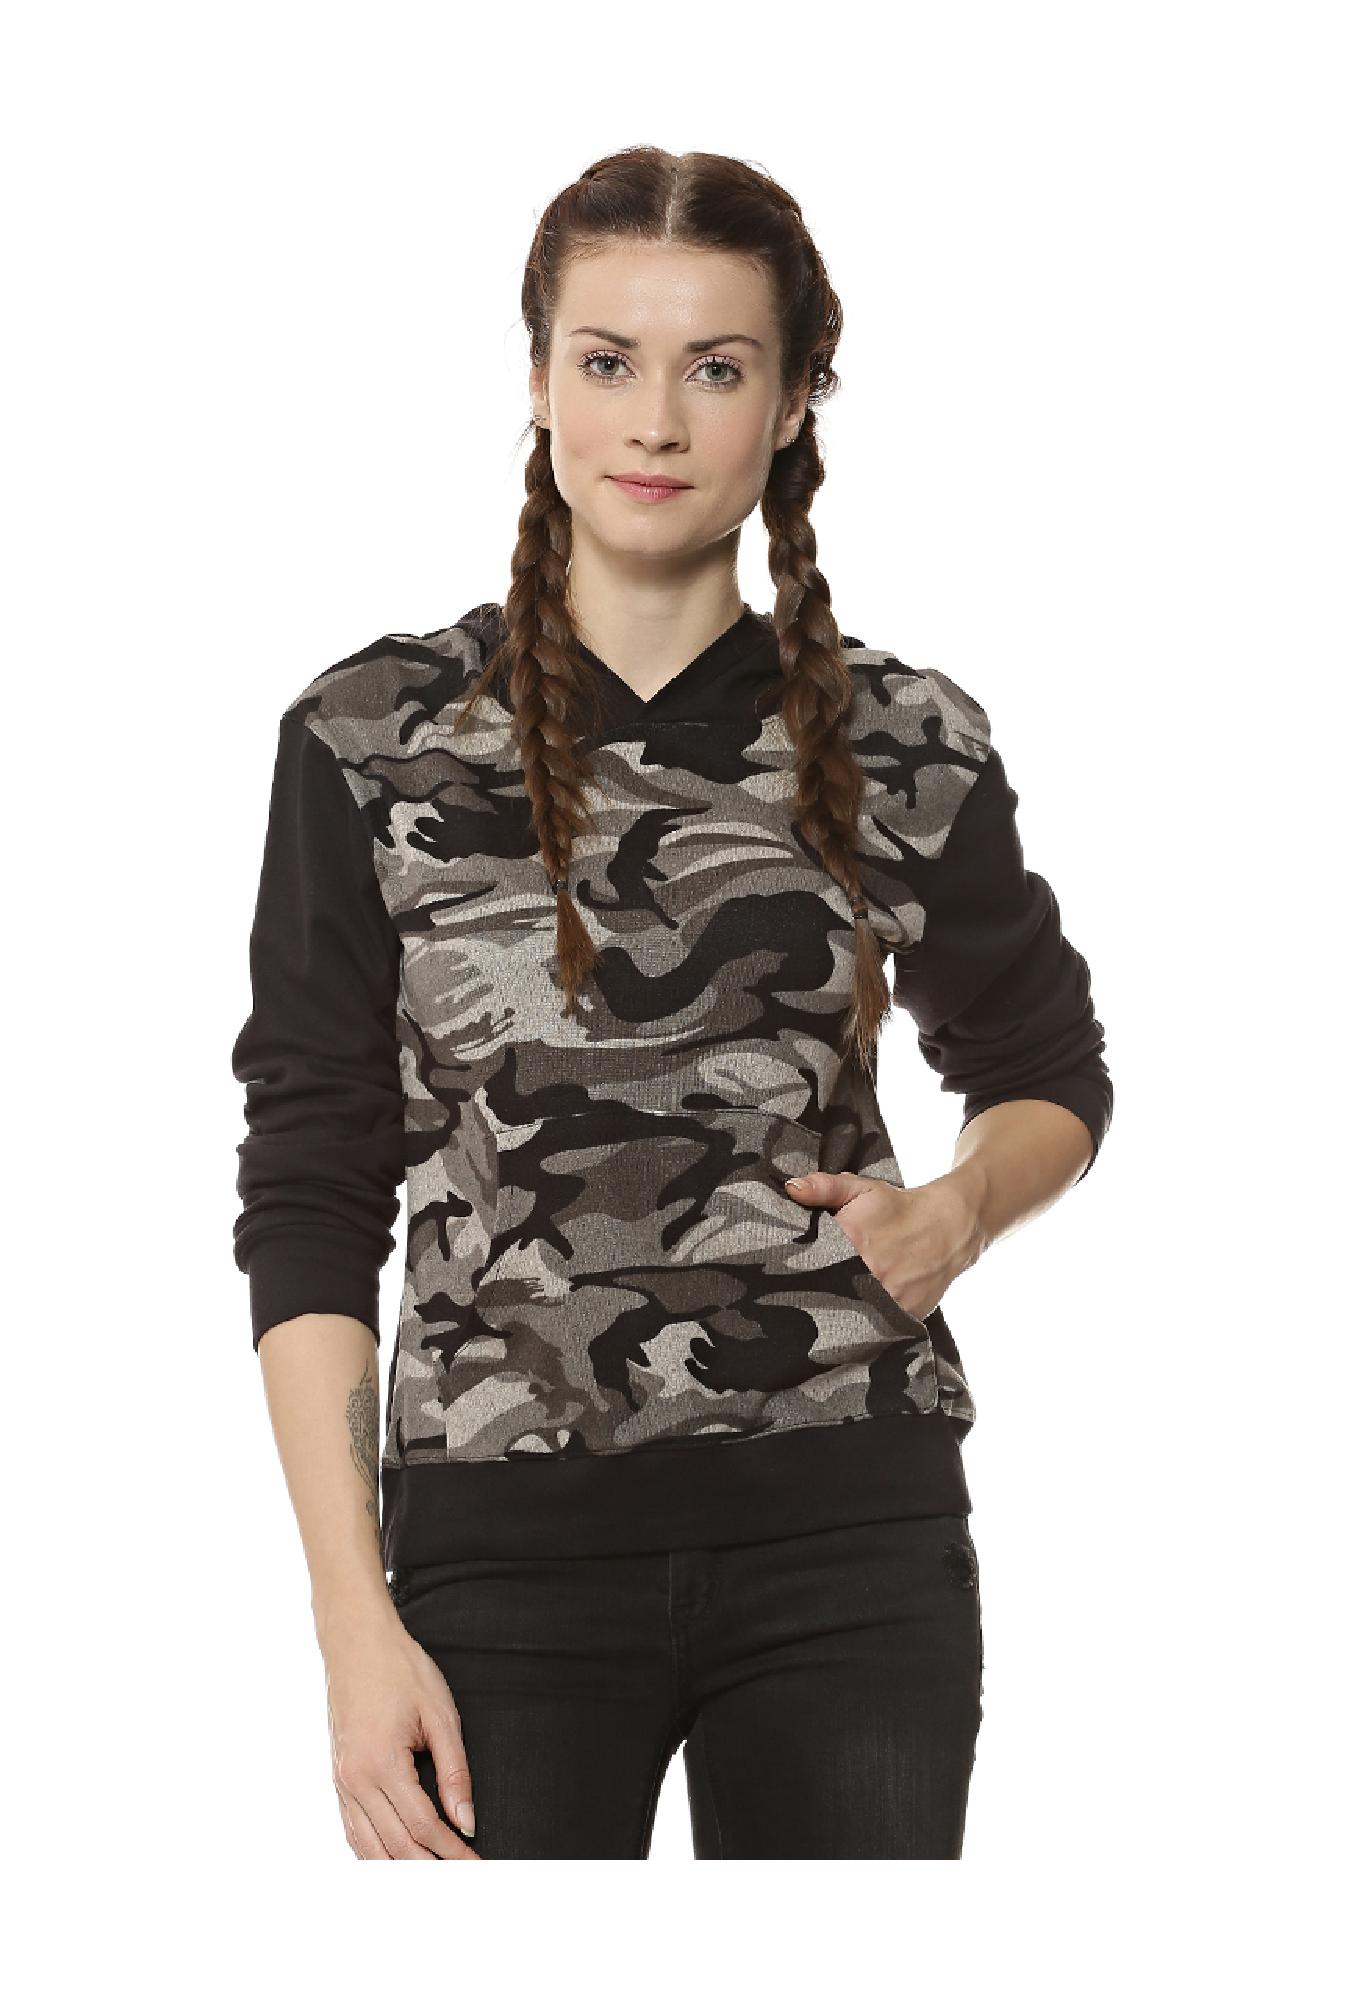 c98280248fac5 Buy Campus Sutra Beige & Black Camo Print Hoodie for Women Online ...